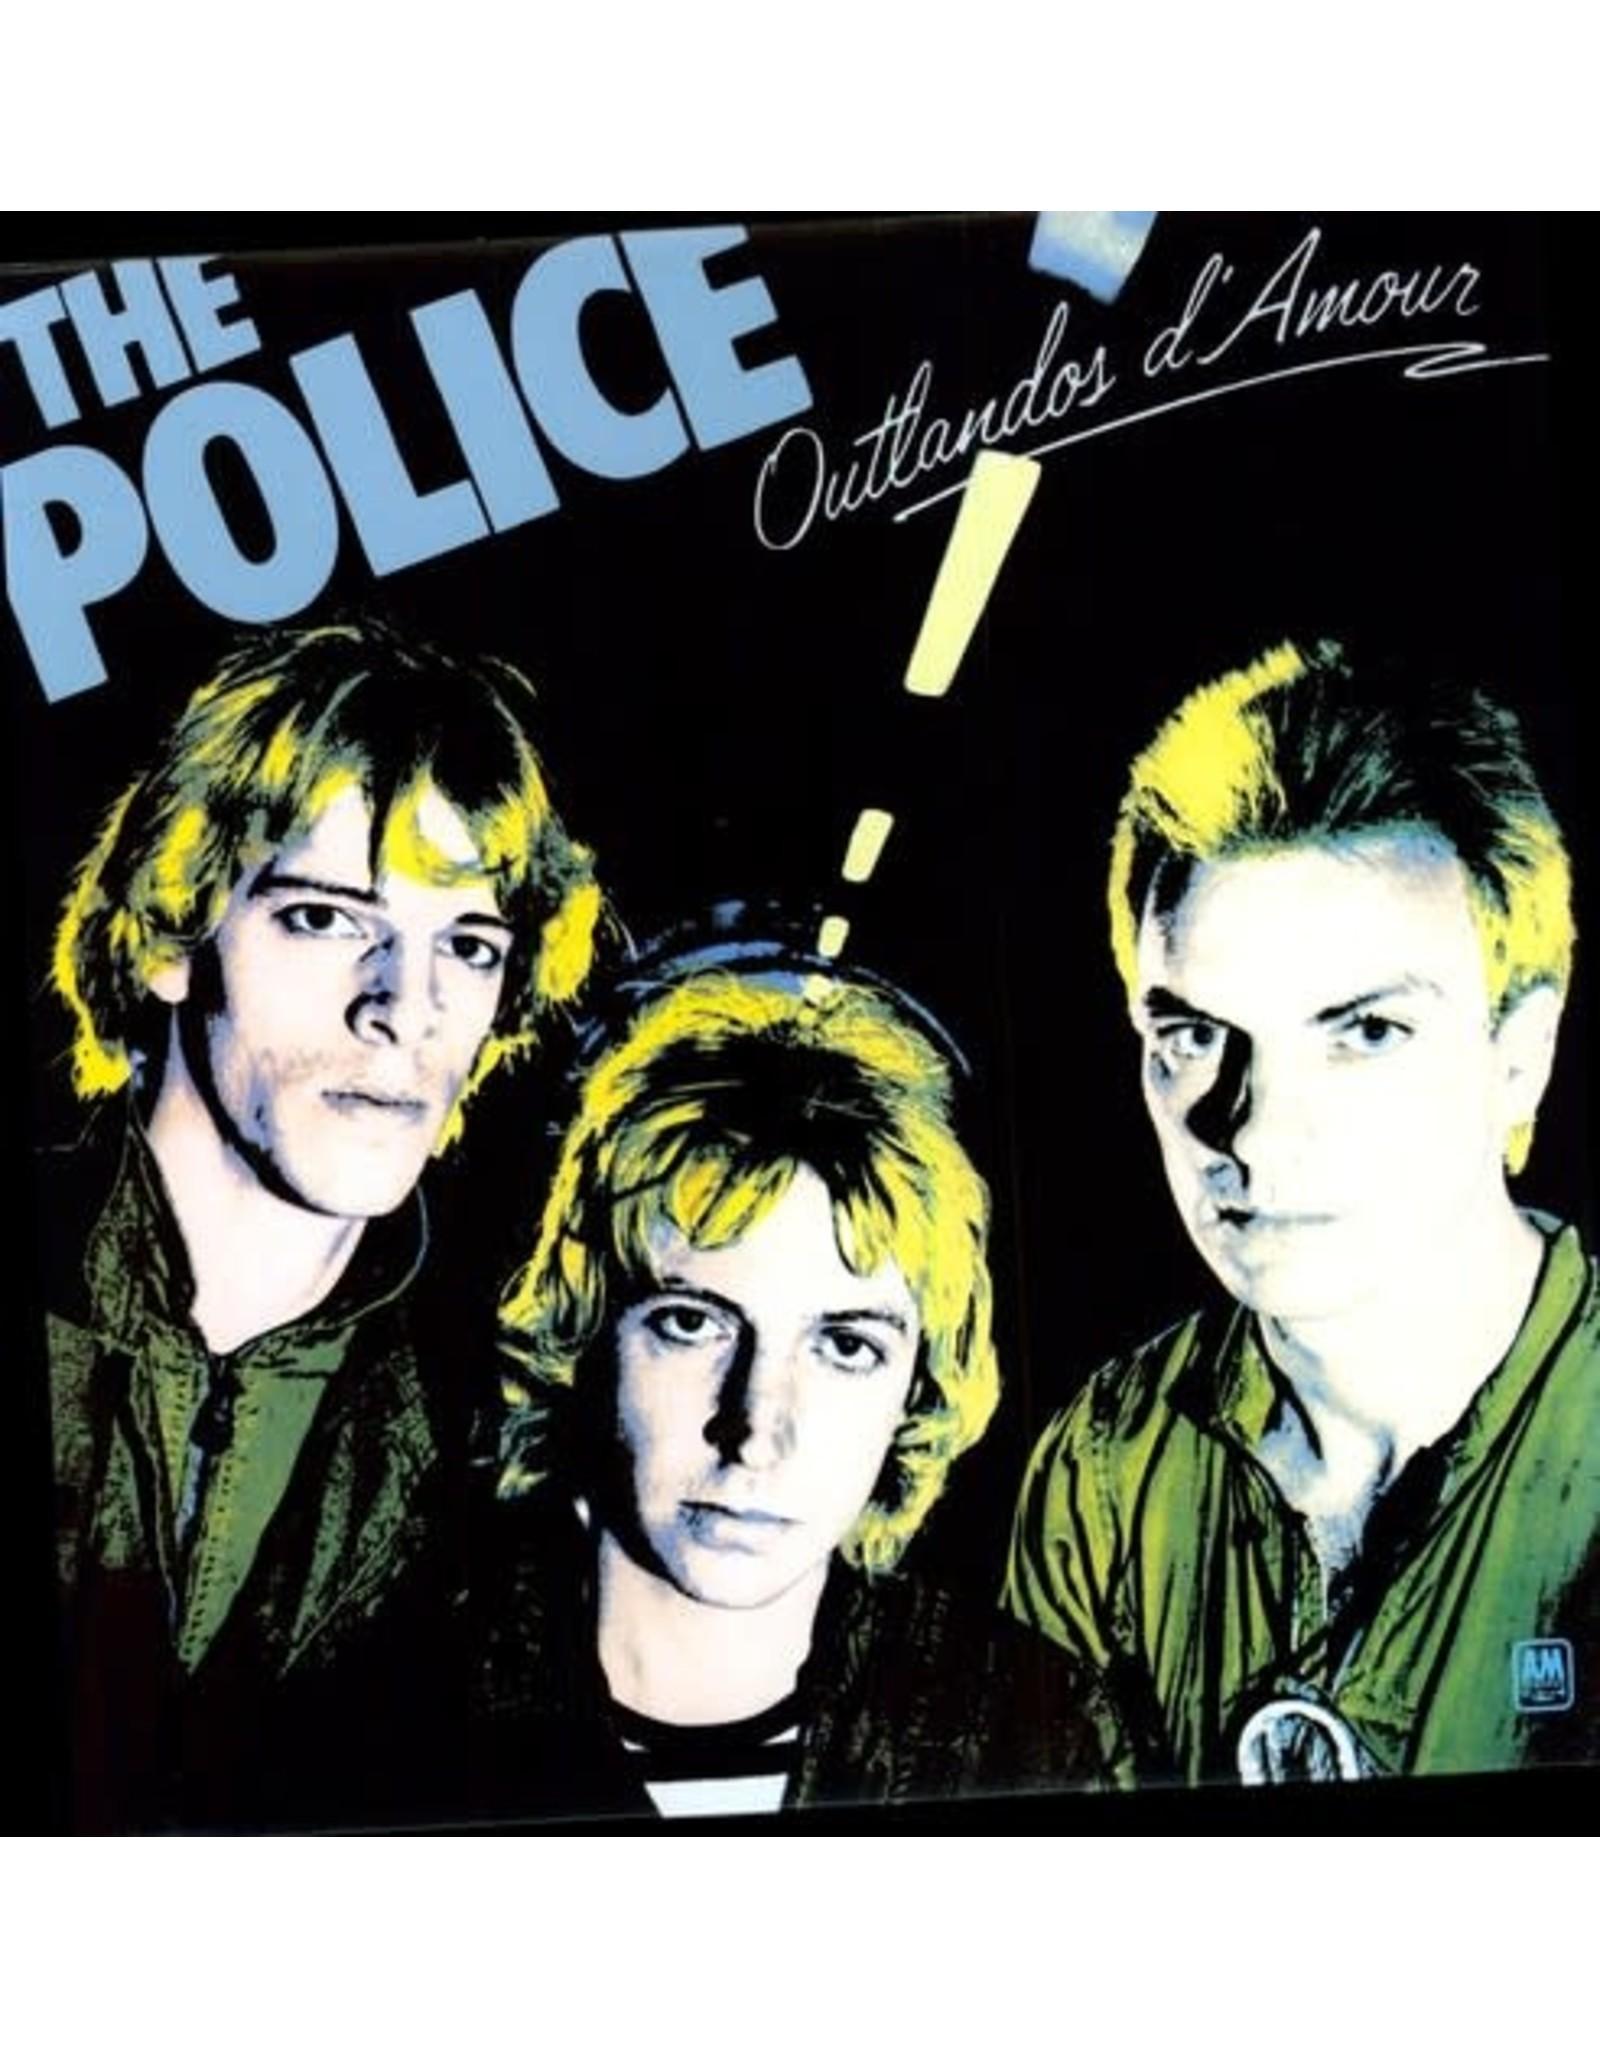 New Vinyl The Police - Outlandos D'Amour LP